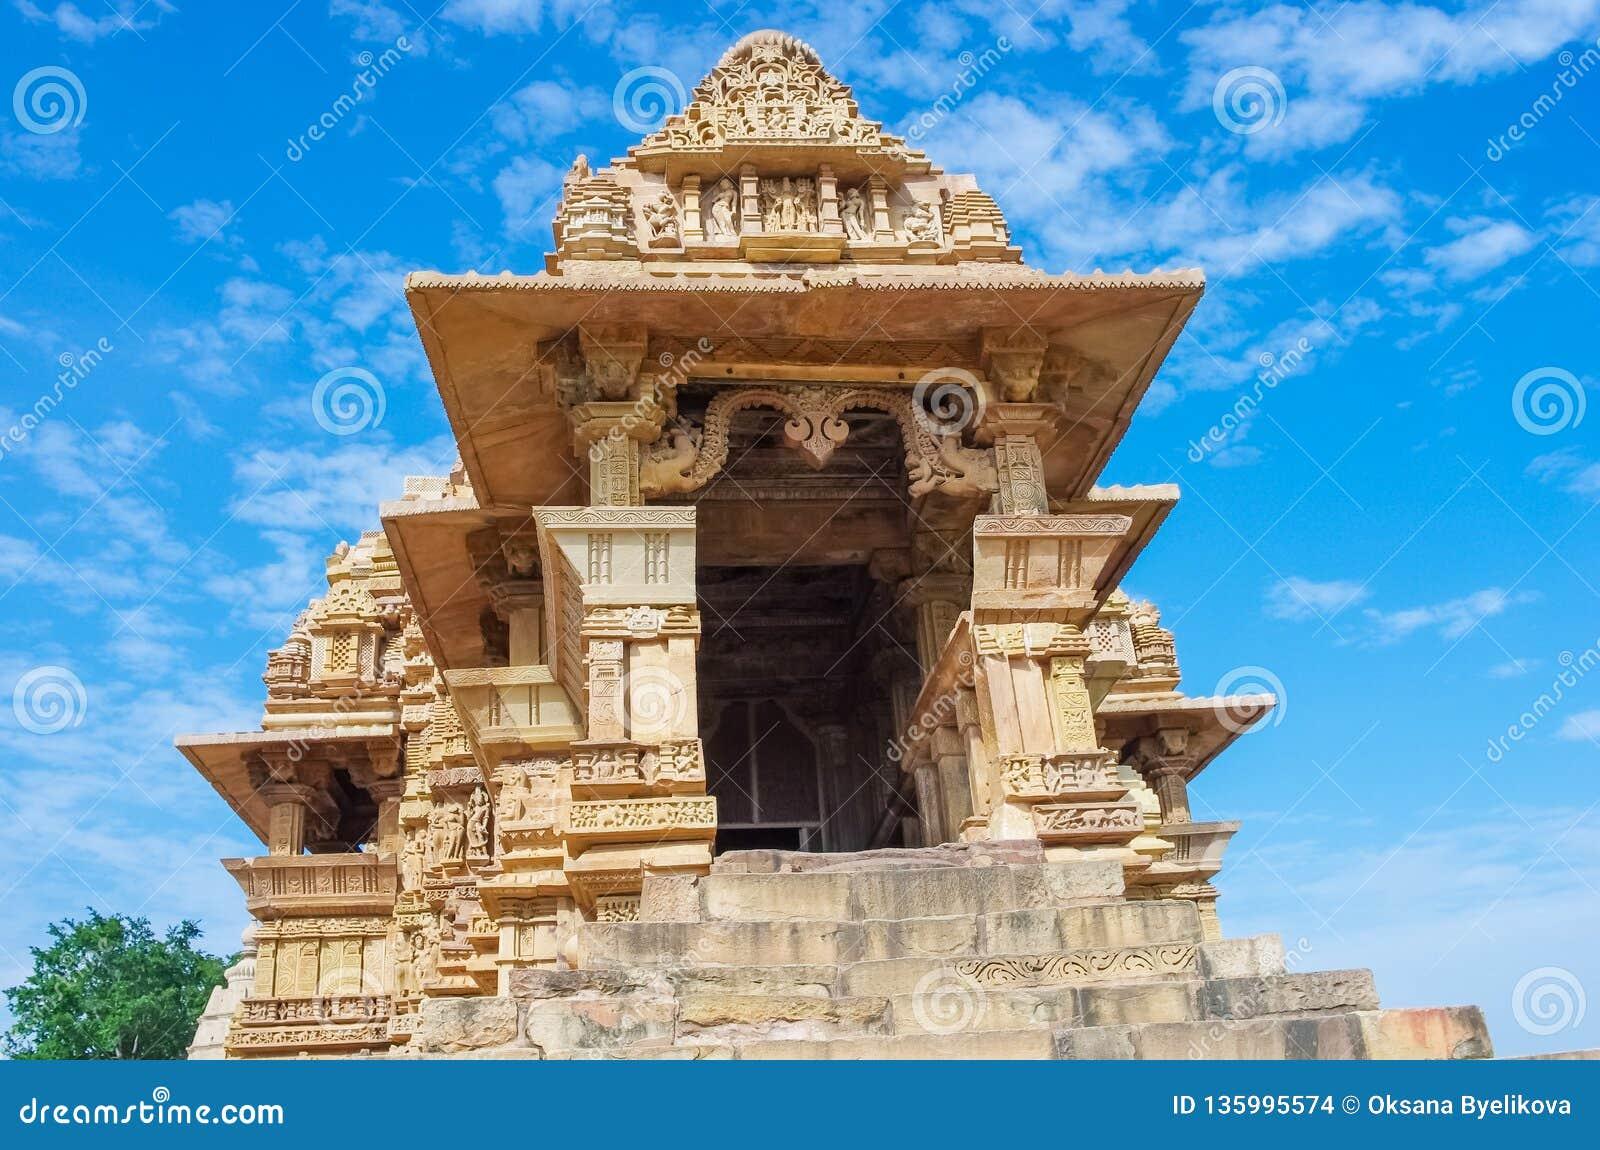 Hindu Temple In Khajuraho, India Stock Photo - Image of